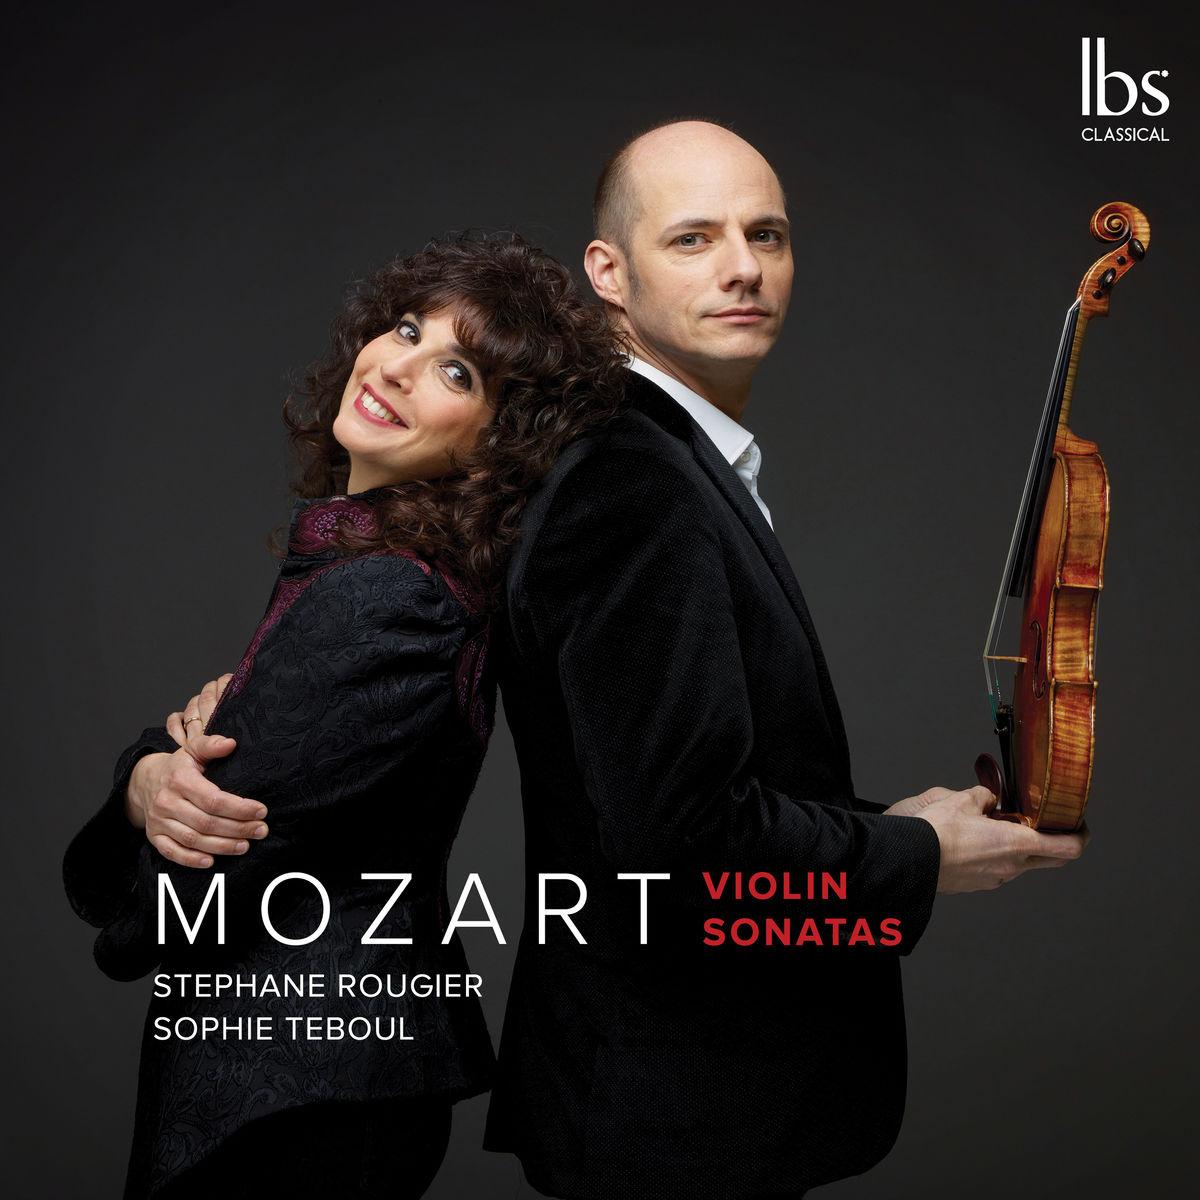 Music is the key: Stéphane Rougier / Sophie Teboul MOZART